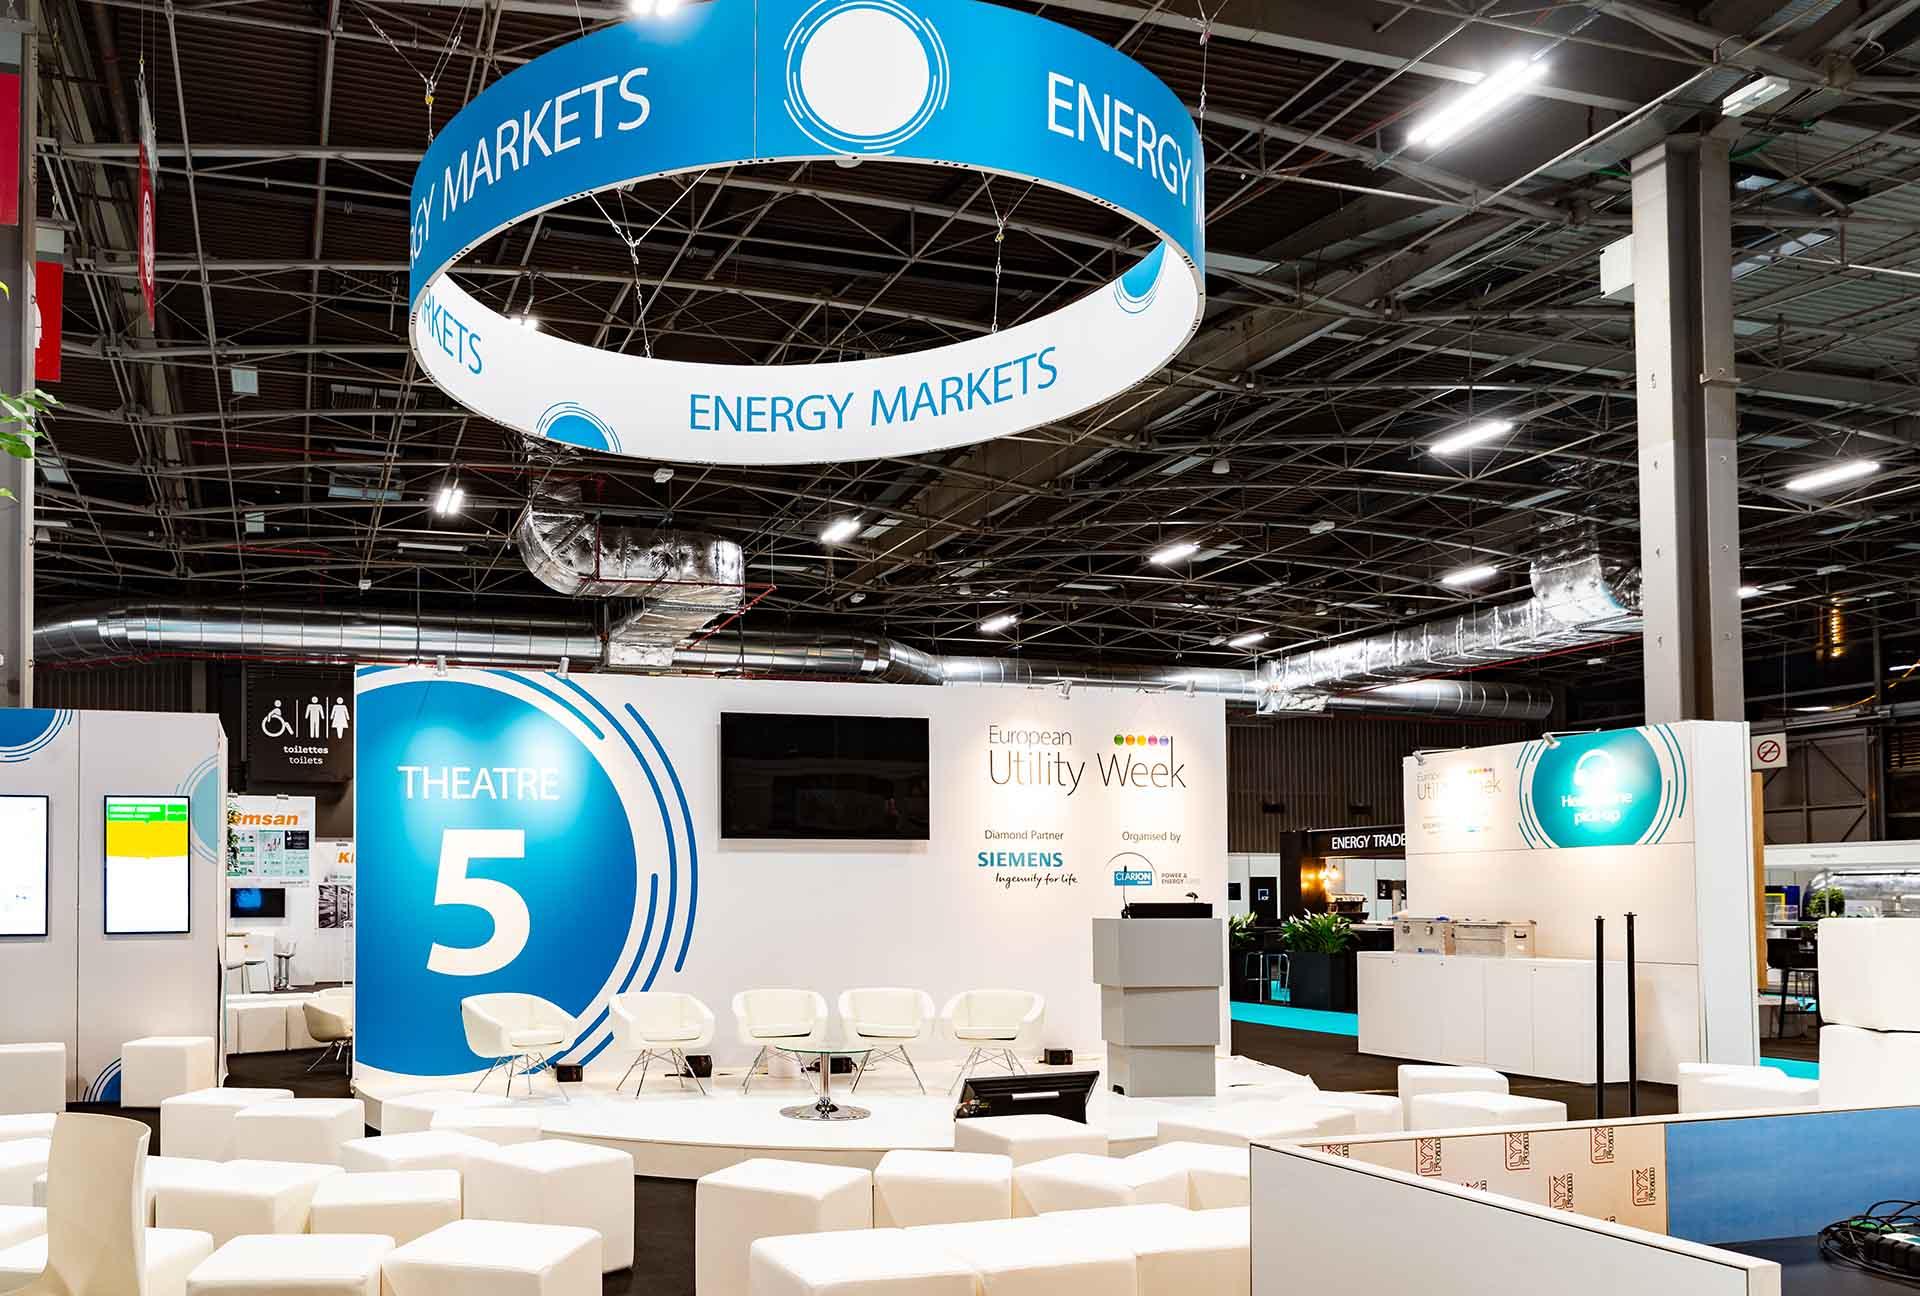 European Utility Week exhibition theatre 5 construction